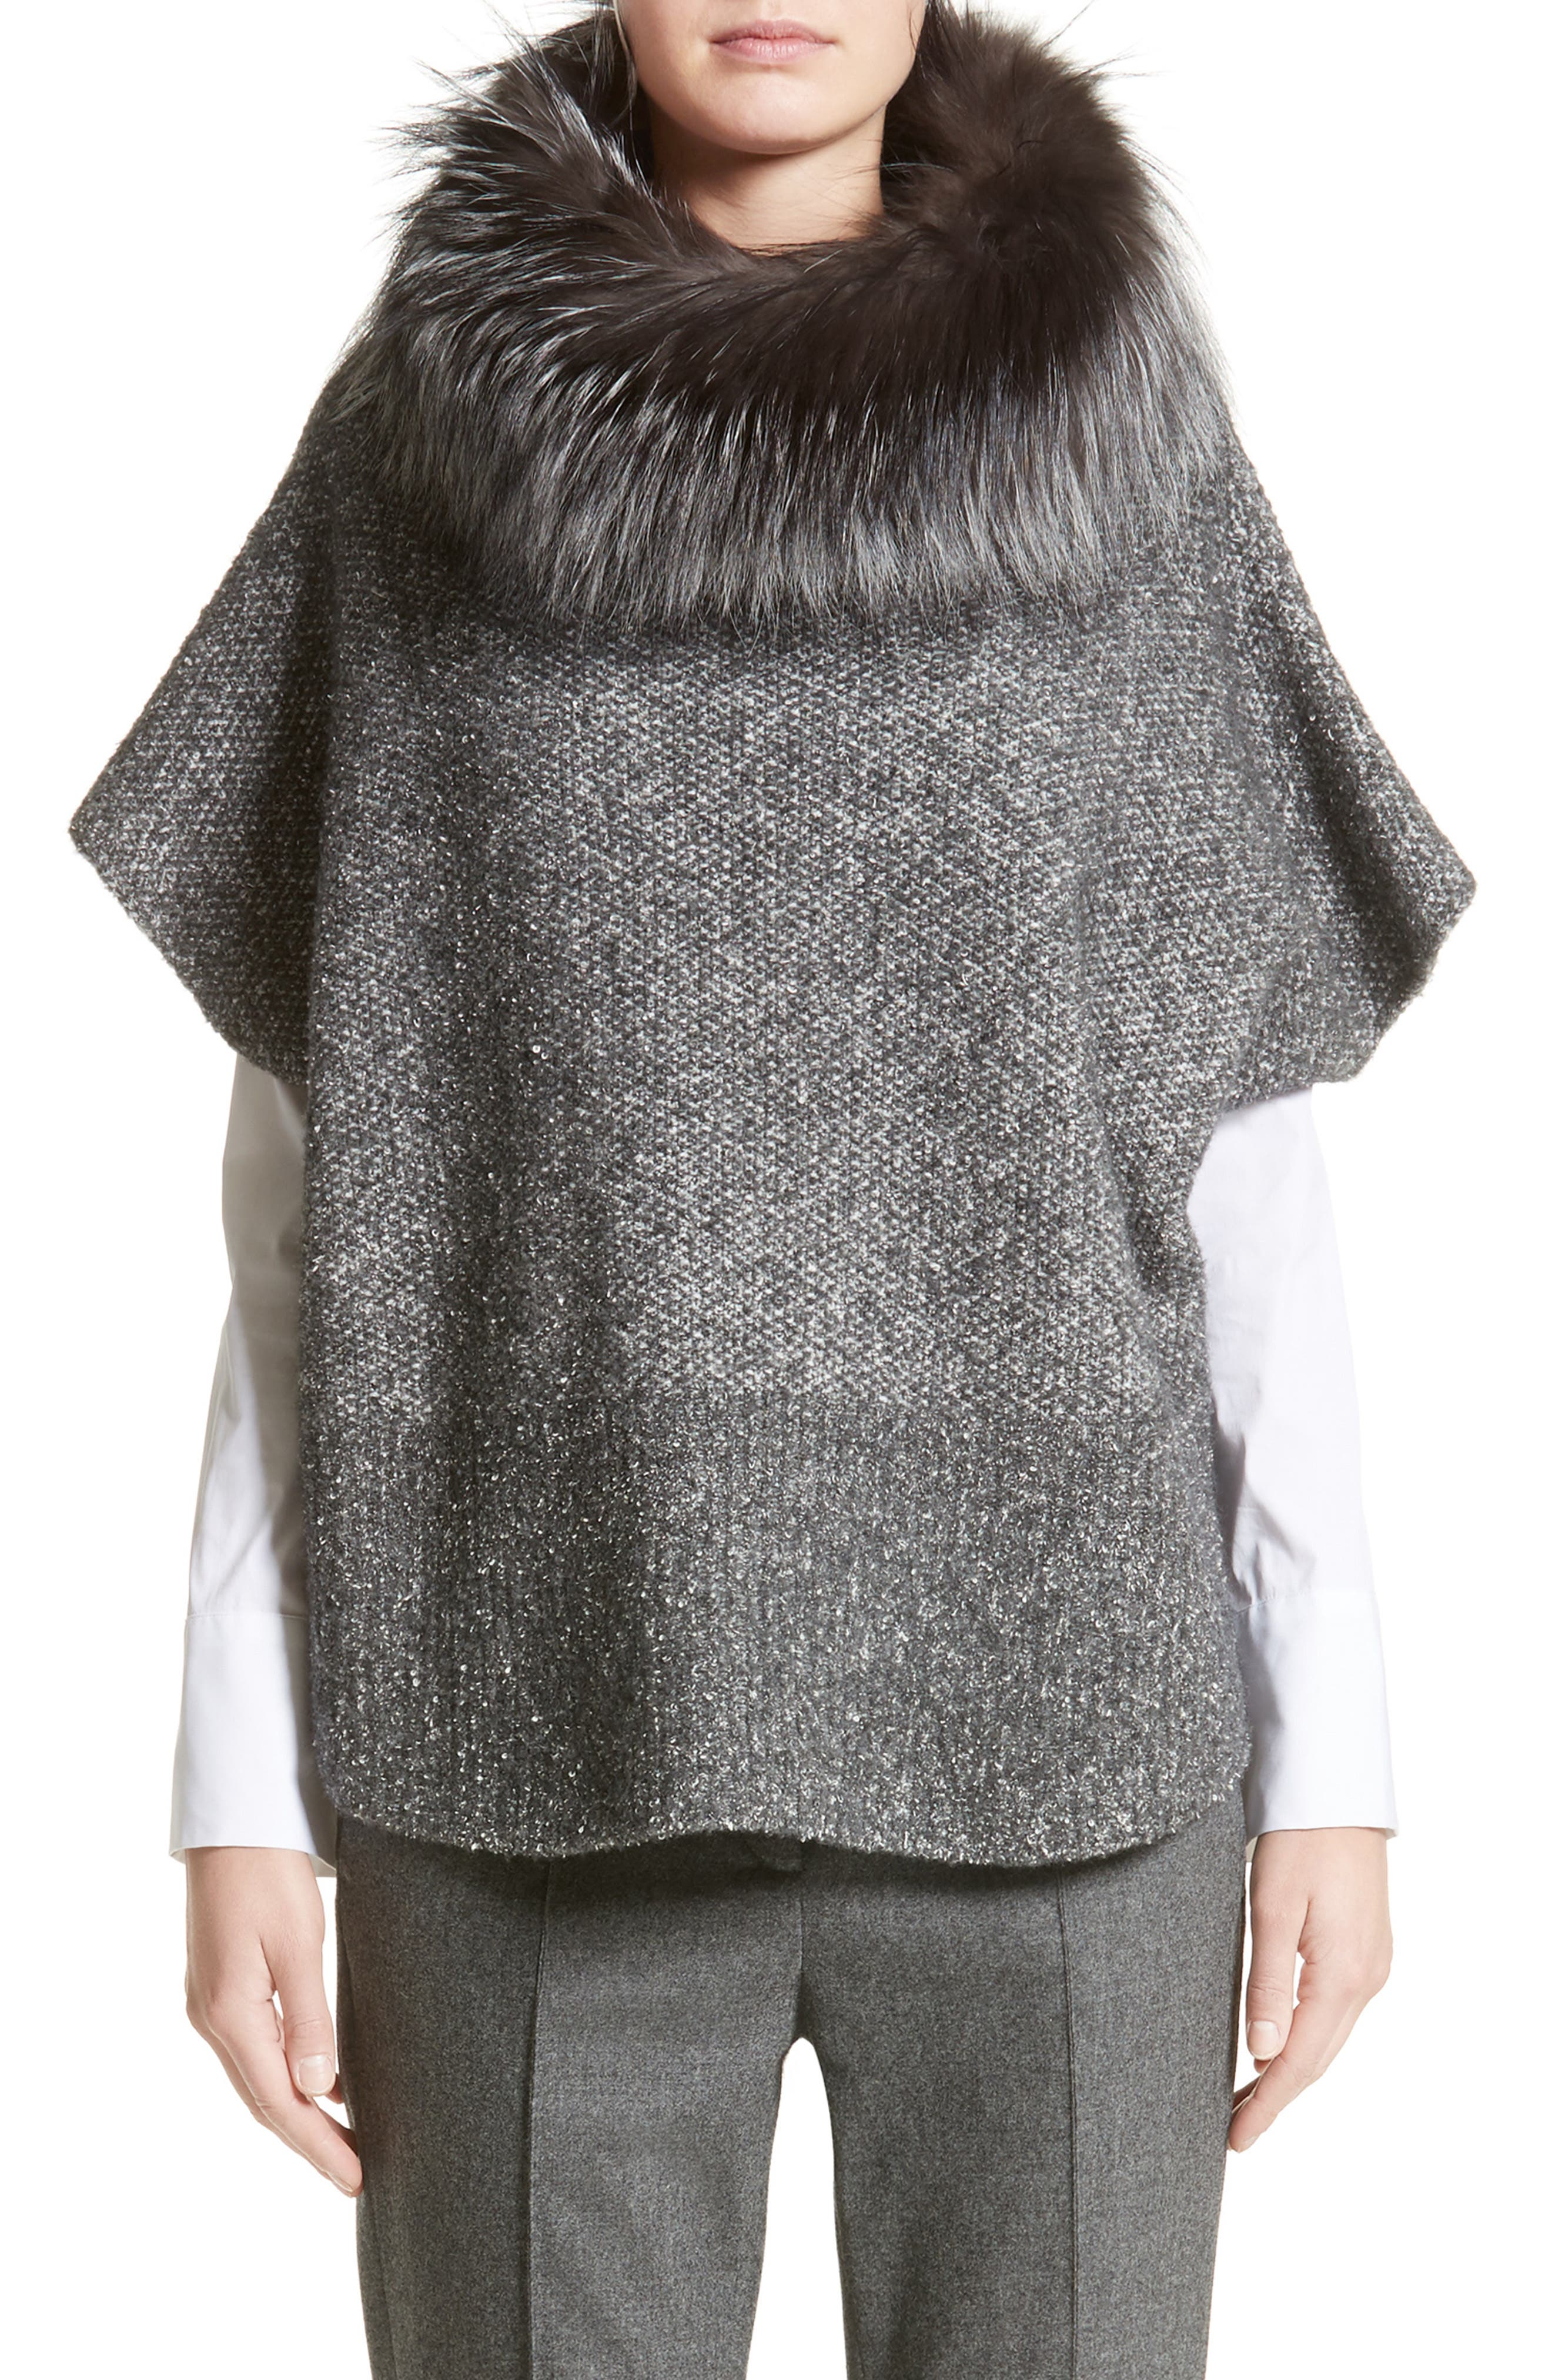 Pebble Tweed Knit Poncho with Genuine Fox Fur Collar,                             Main thumbnail 1, color,                             Grey Multi